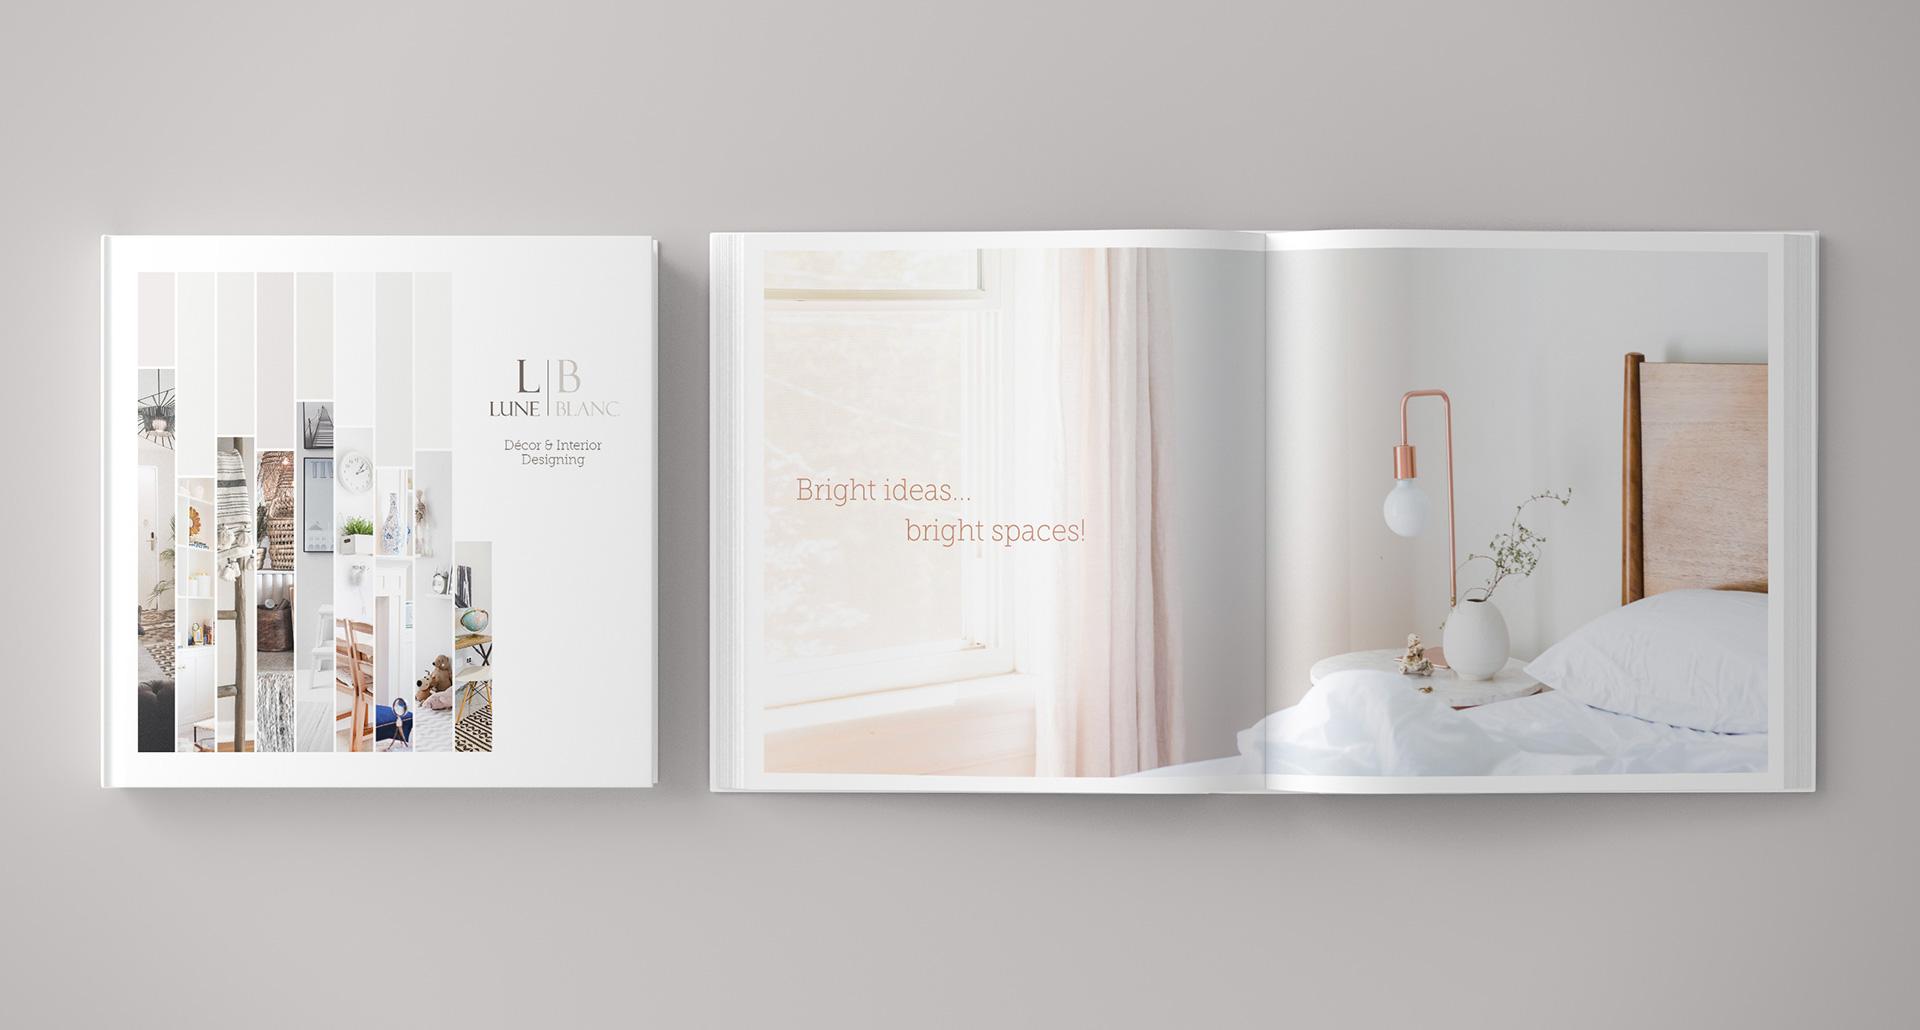 Coffee Table Book Interior Design Decor Kiran Qureshi Creative Graphic Designer Photographer,Front Yard Garden Design Ideas With Pebbles